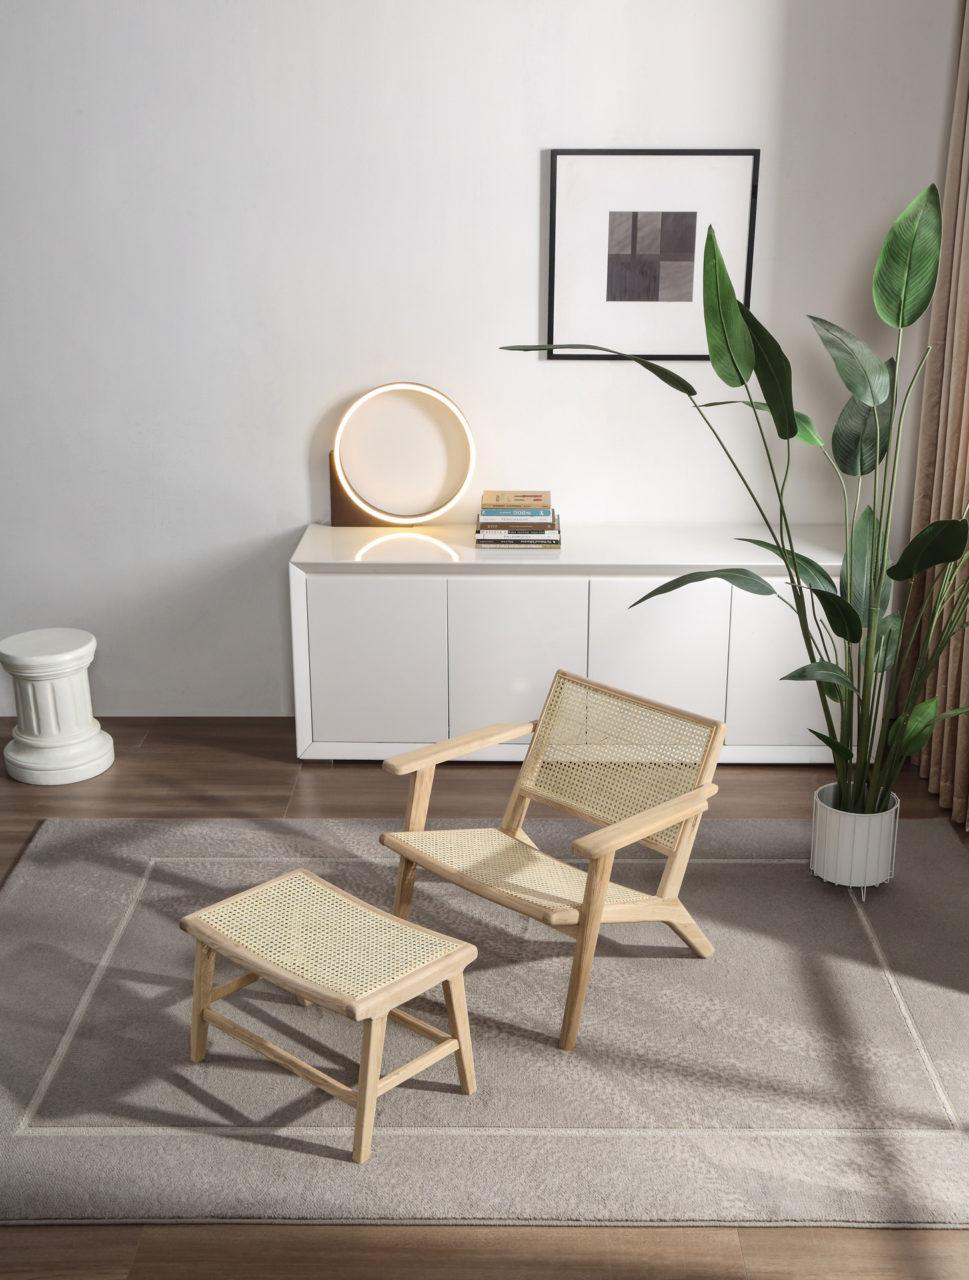 Vakker rotting stil ikea Stockholm skap stil norsk design.